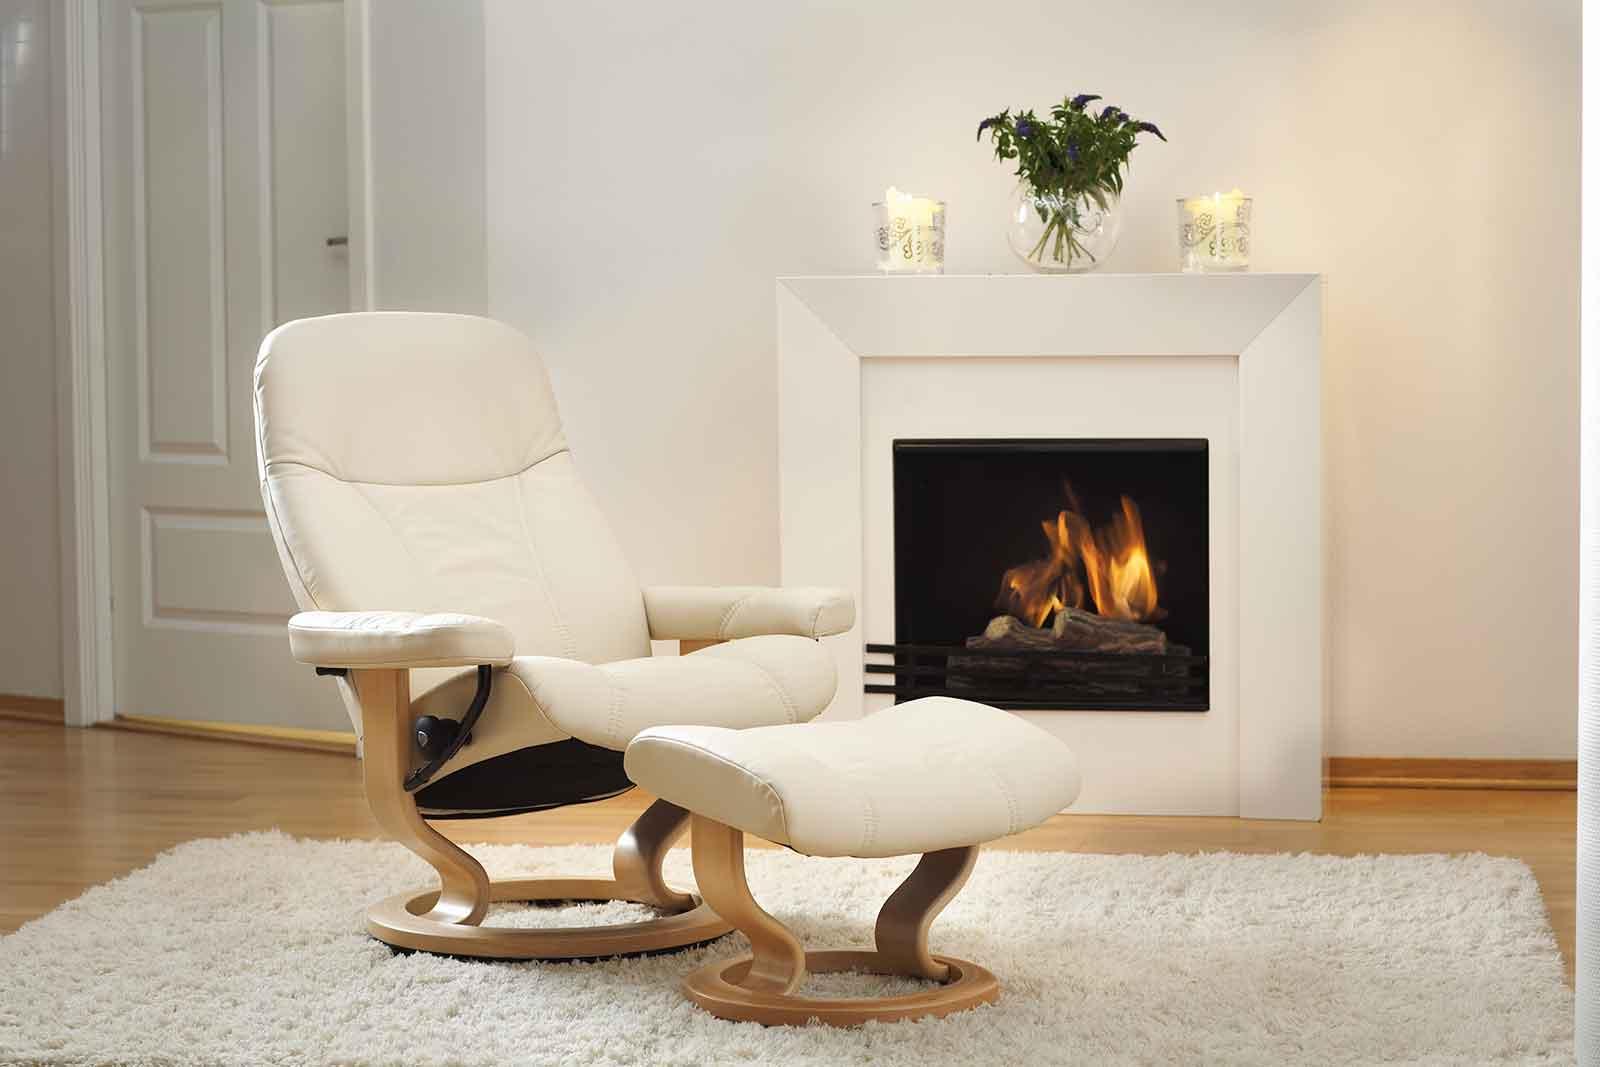 konfigurator stresssless consul classic hocker geschenkt. Black Bedroom Furniture Sets. Home Design Ideas